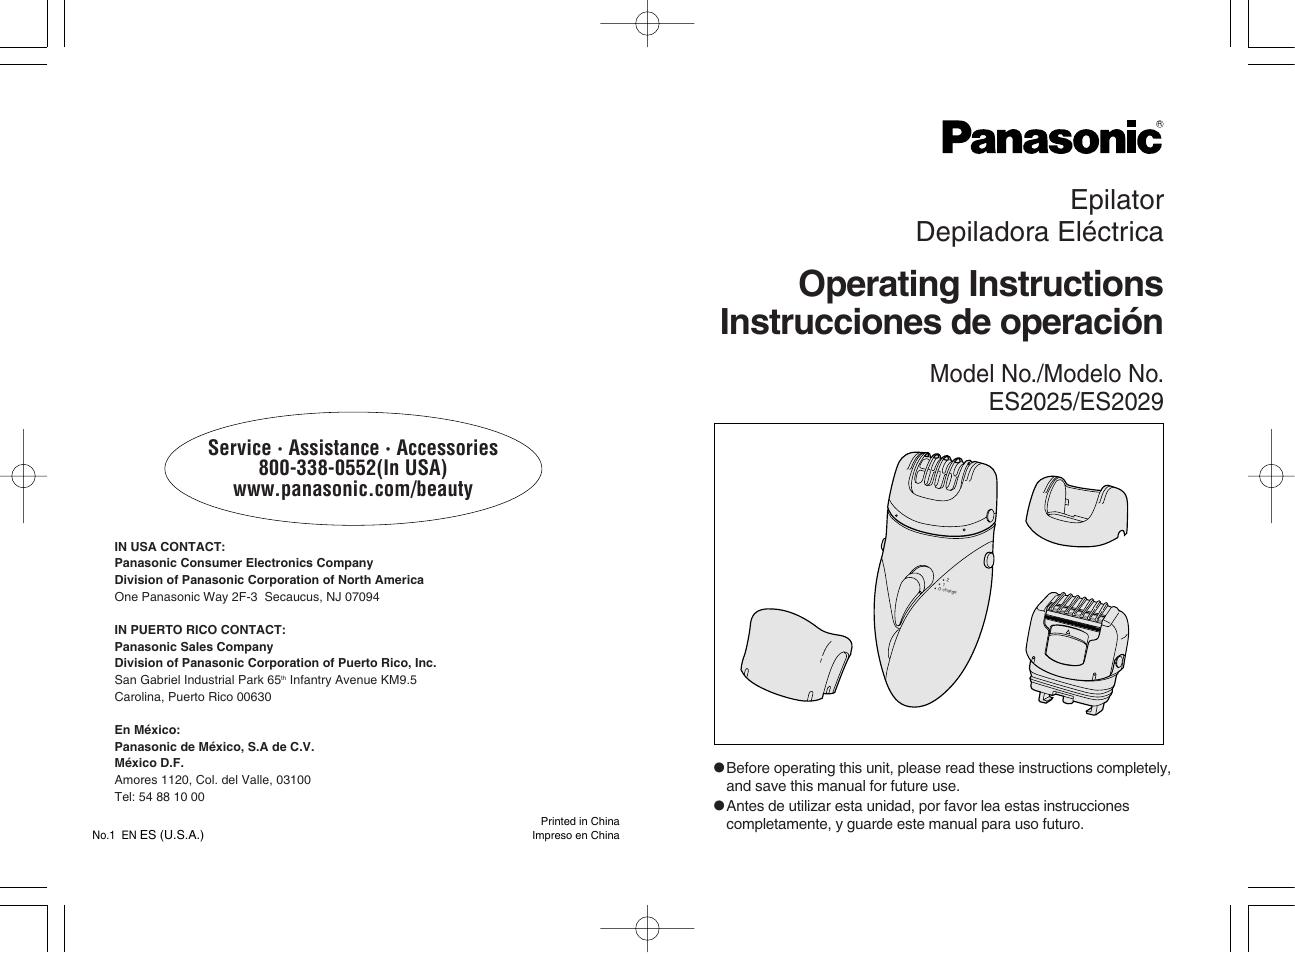 panasonic user manuals usa